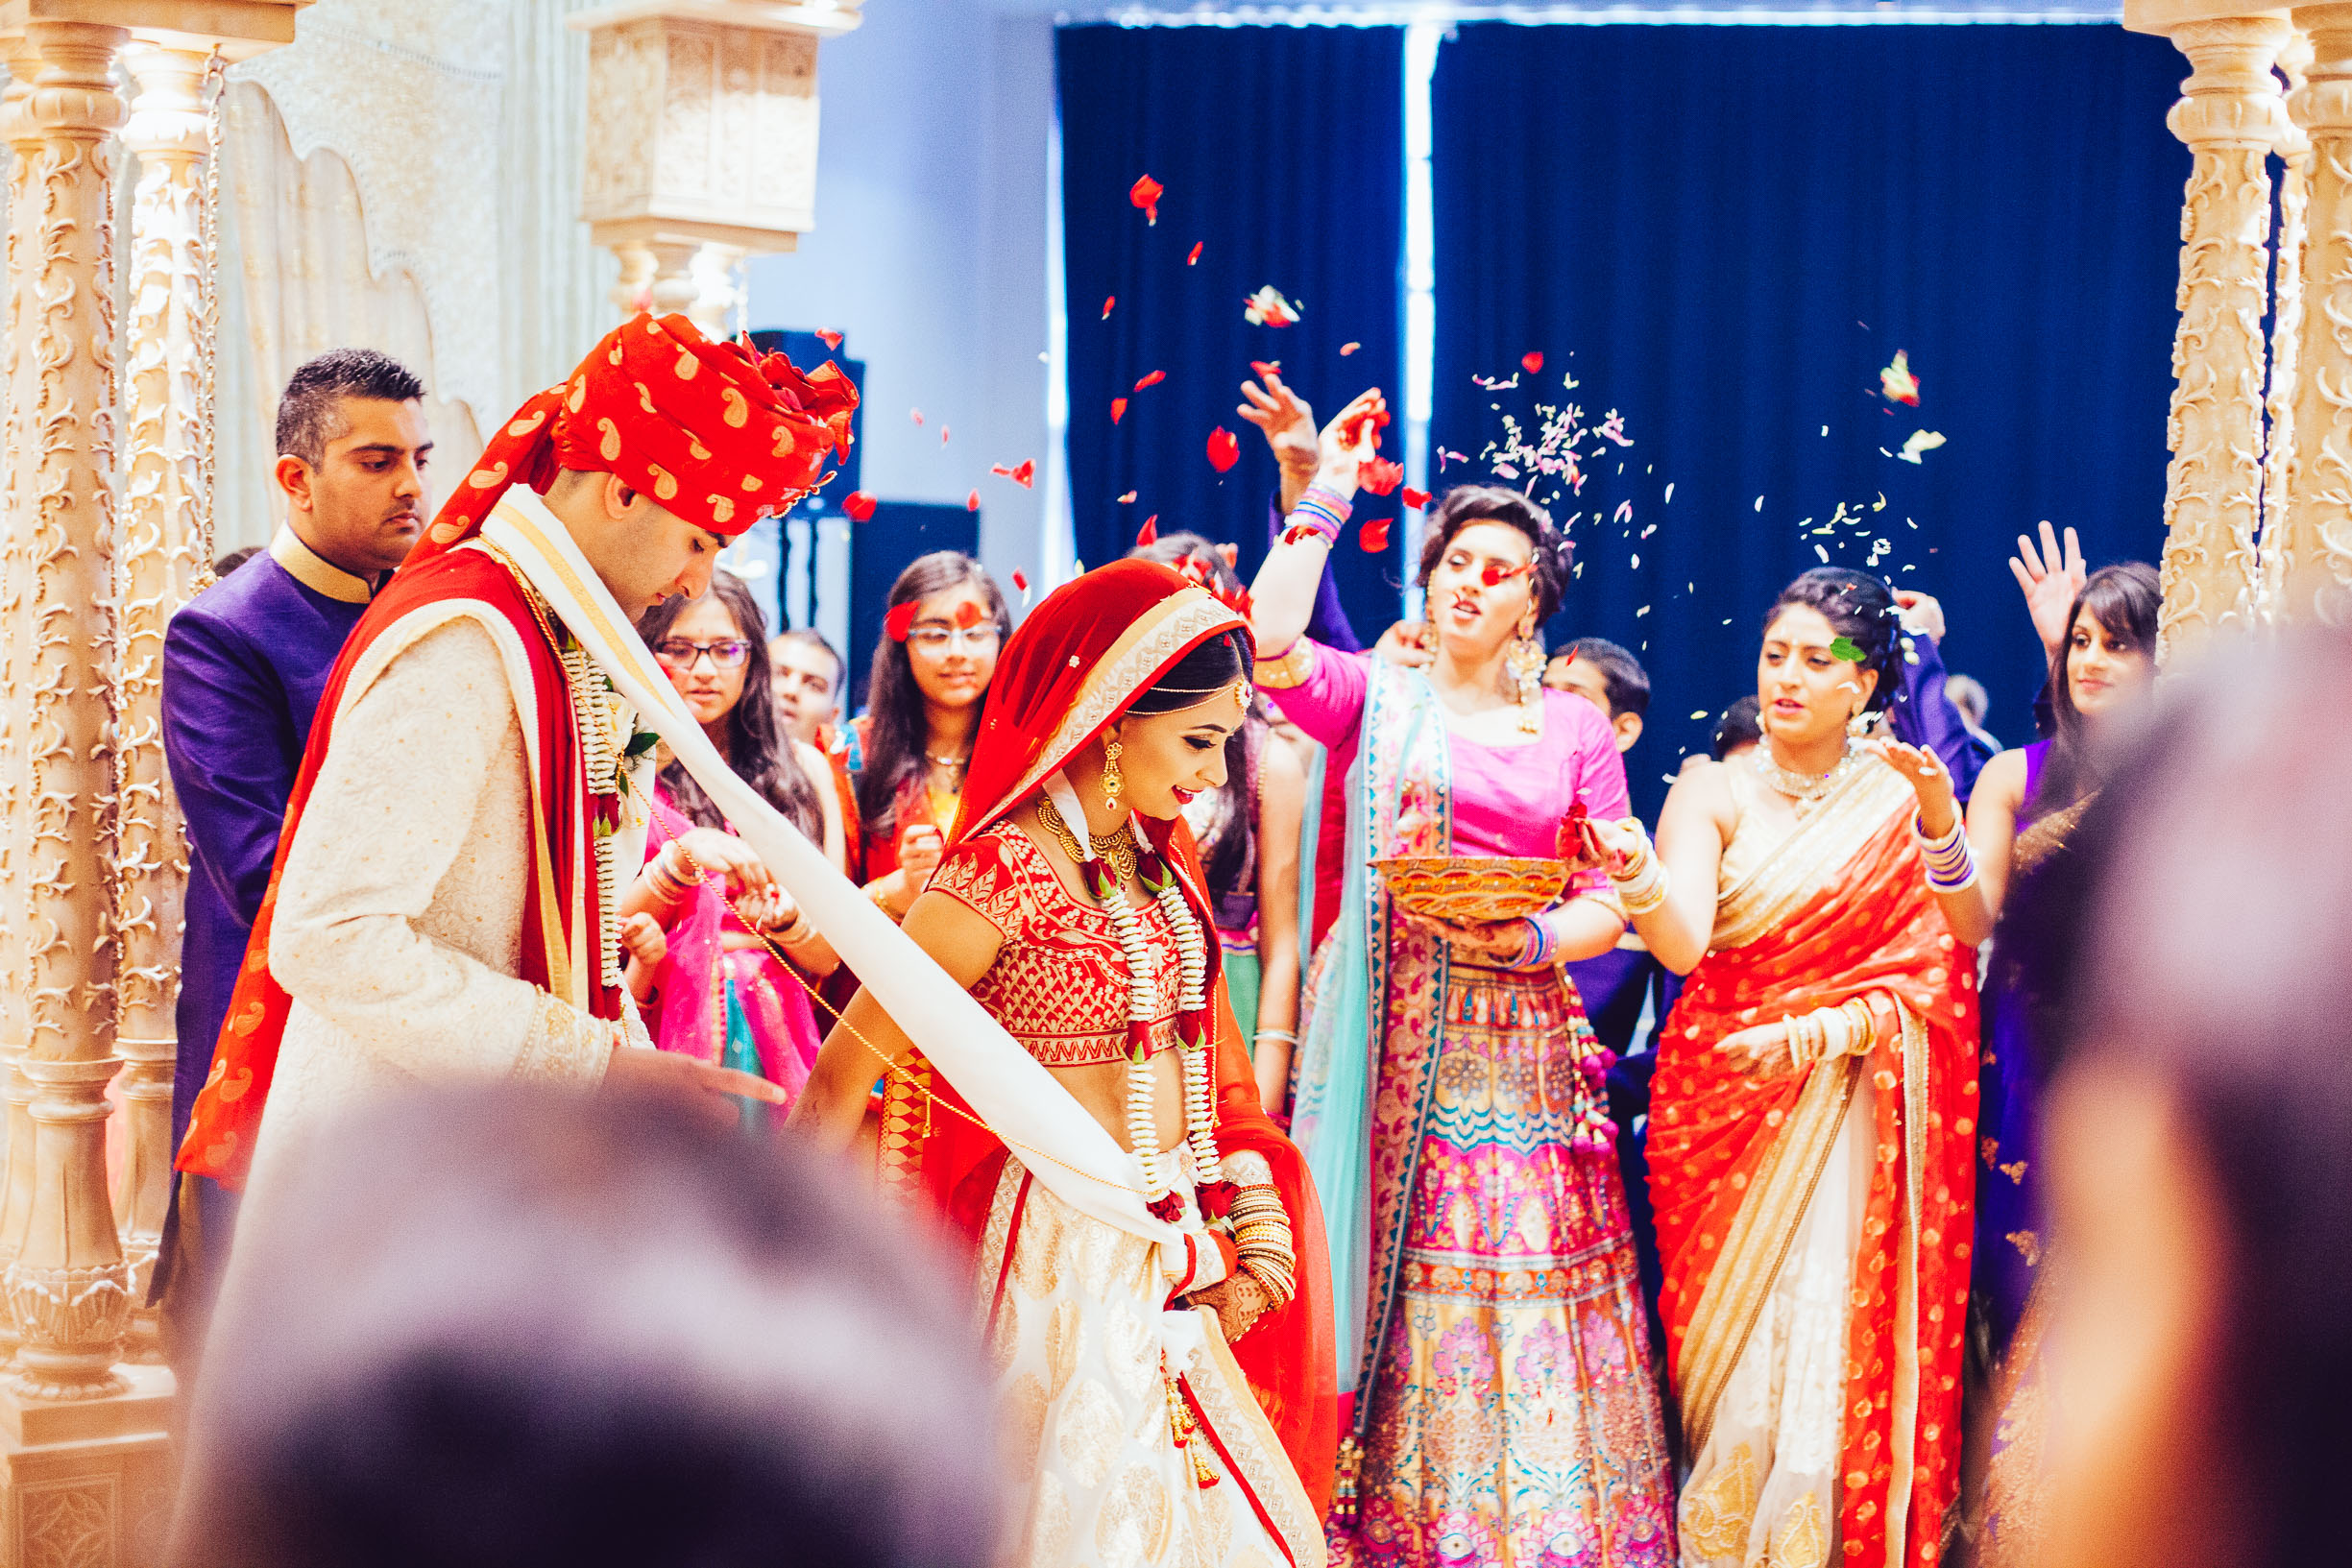 amit&ceema_eden_moments_wedding_photography-13